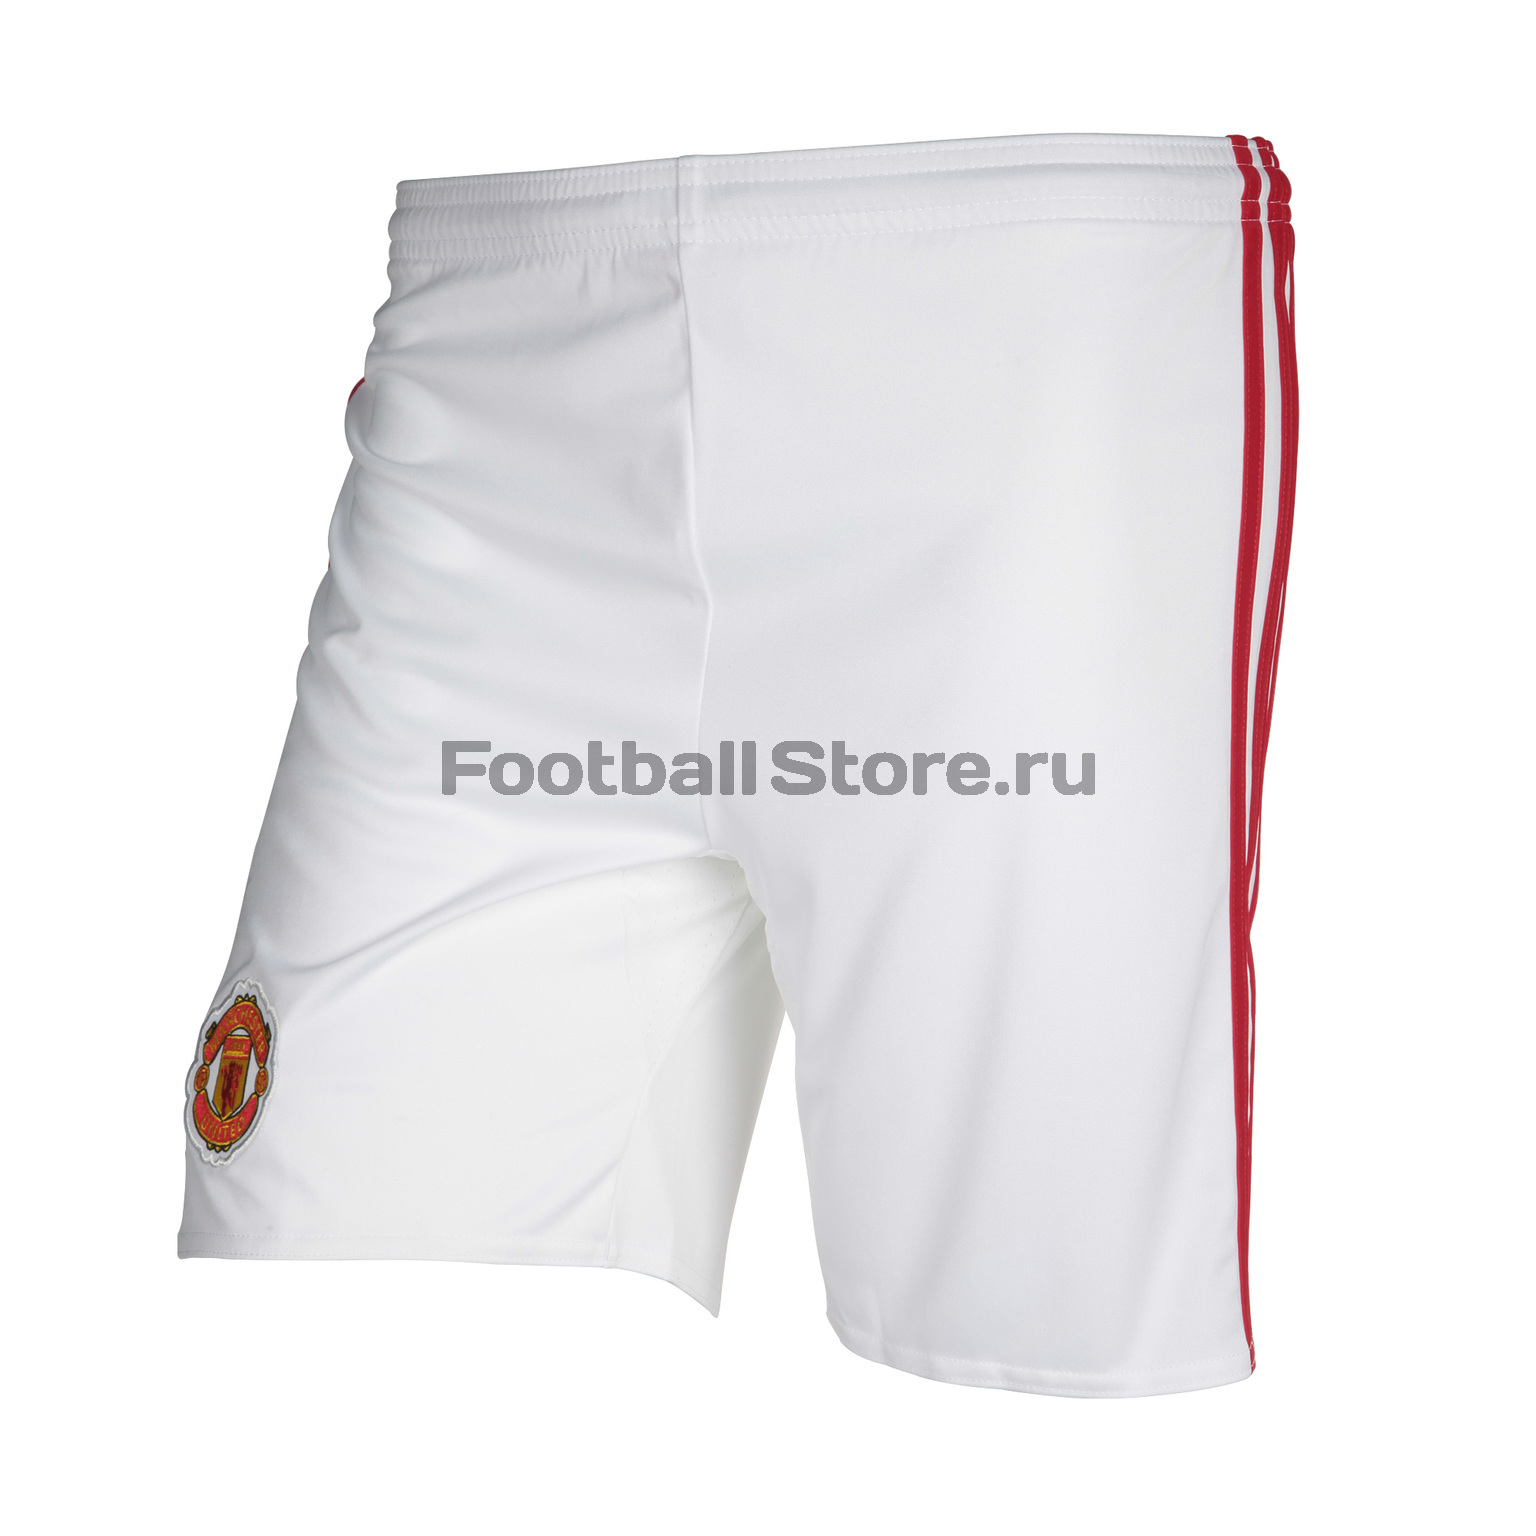 Adidas Шорты подростковые Adidas Manchester United Home AI6712